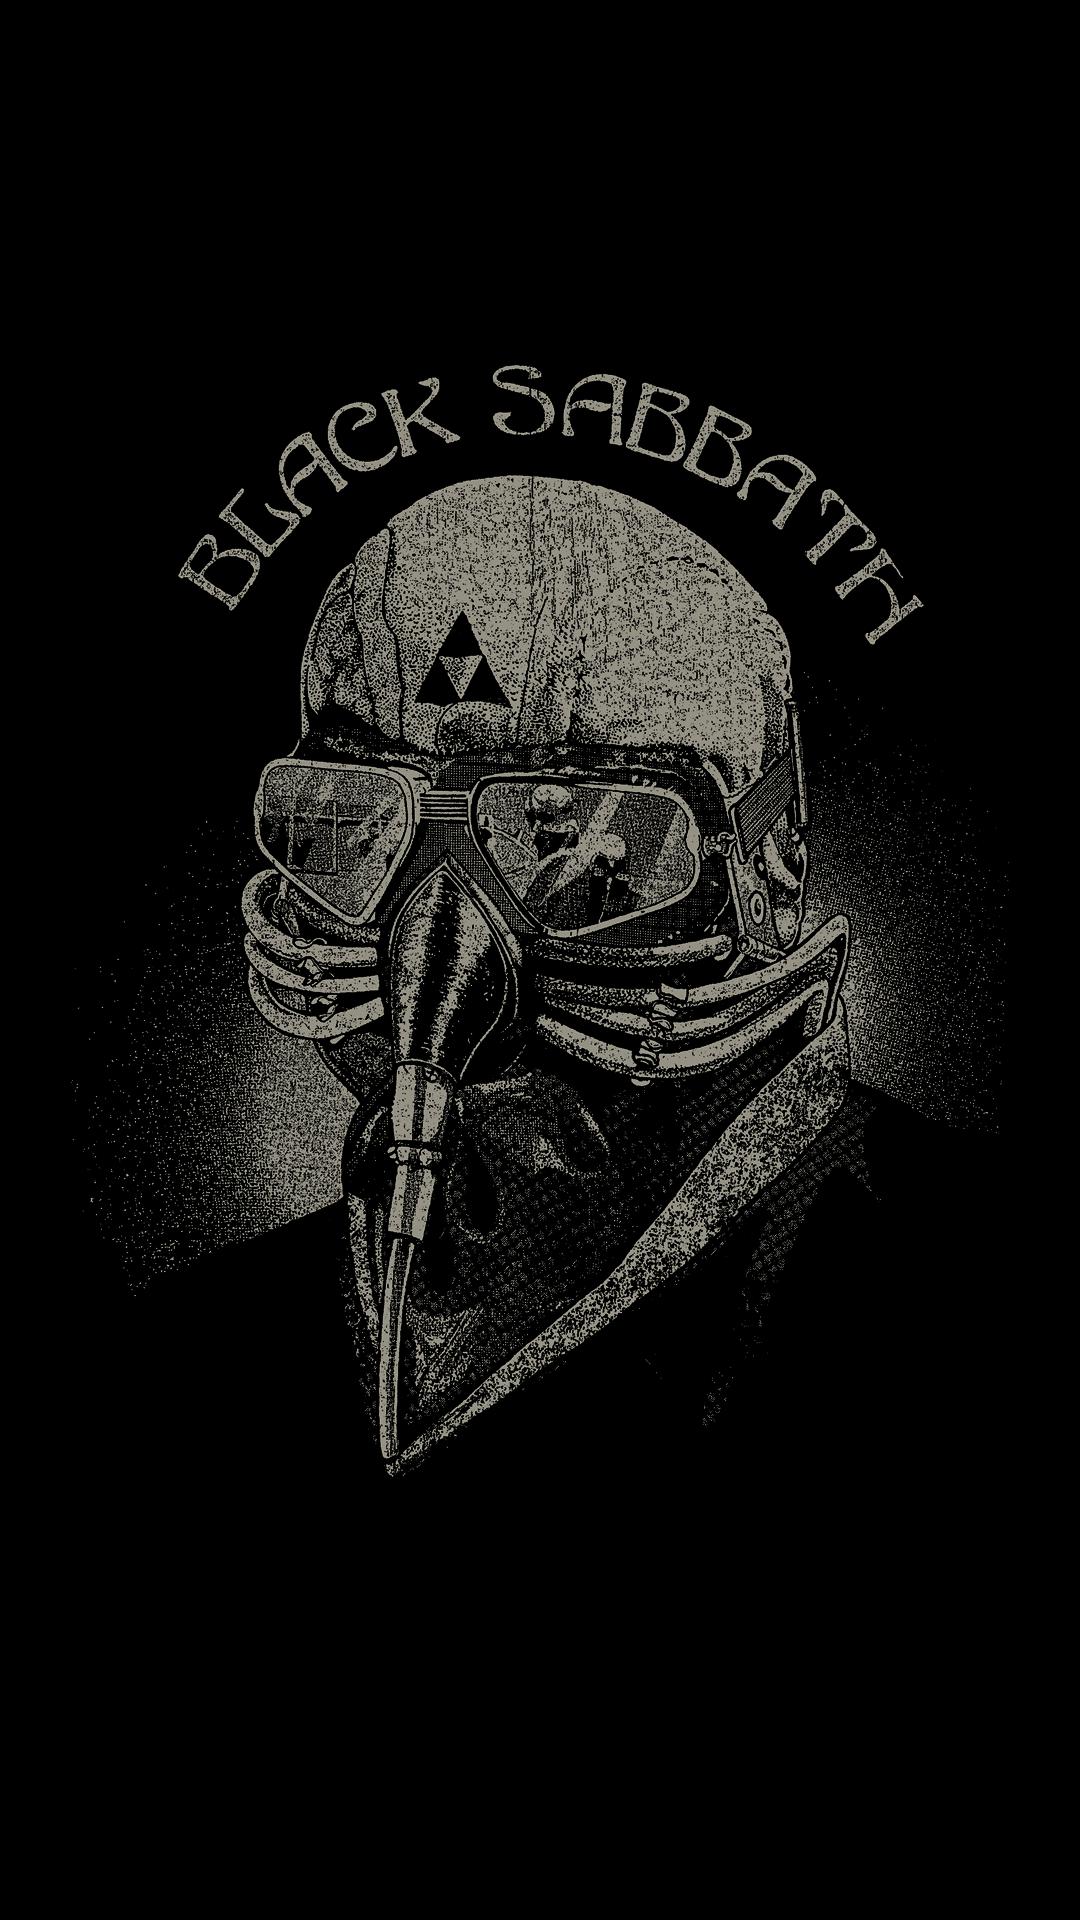 Black Sabbath htc one wallpaper